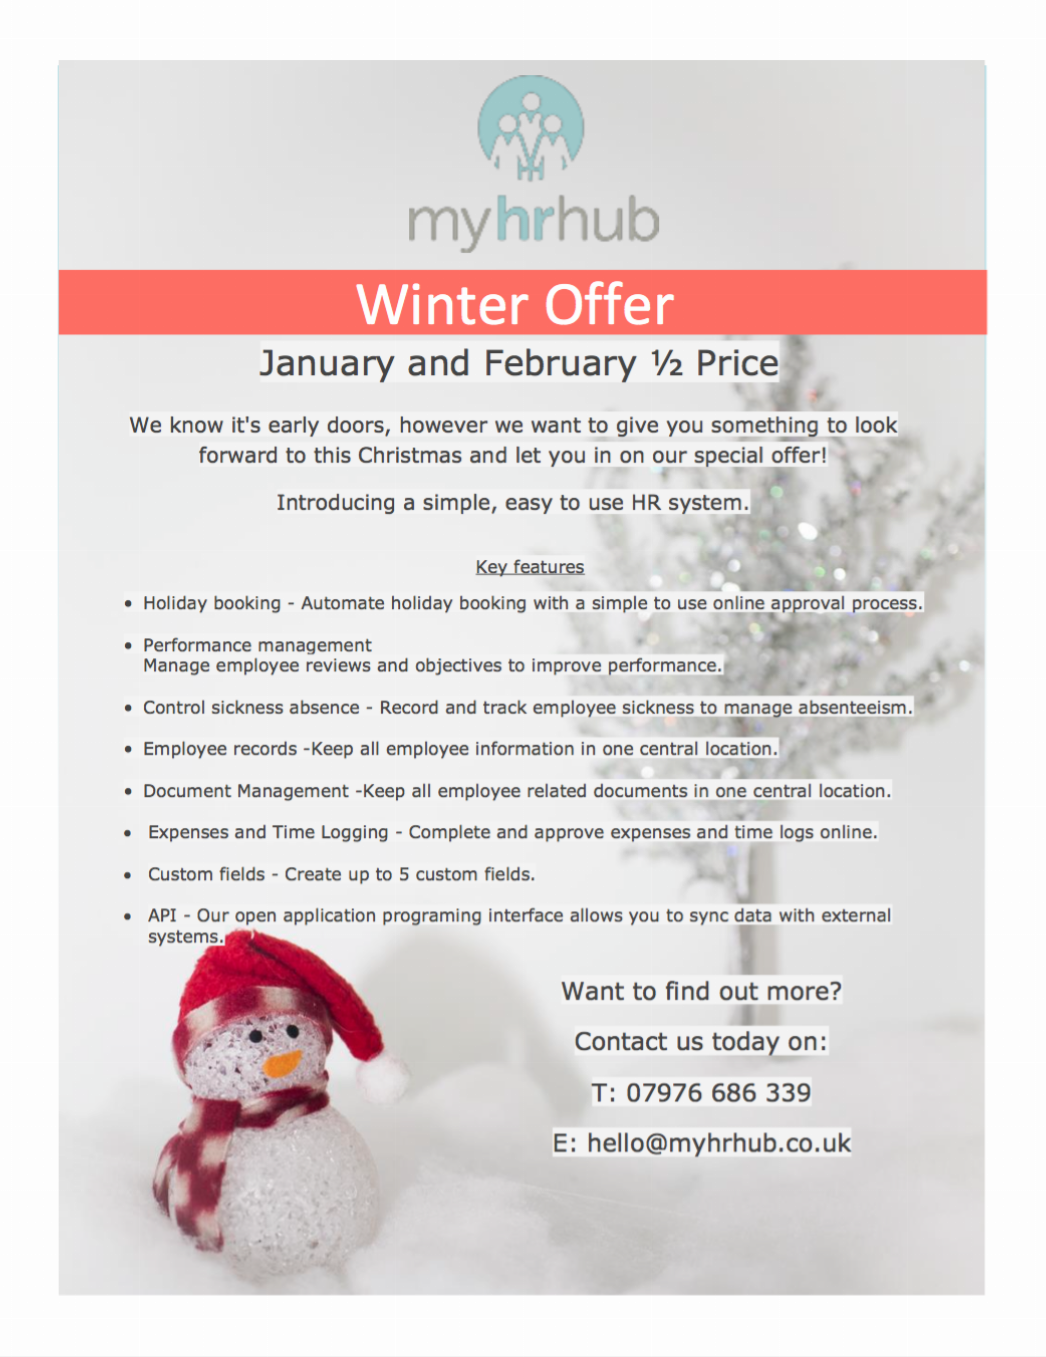 Winter offers